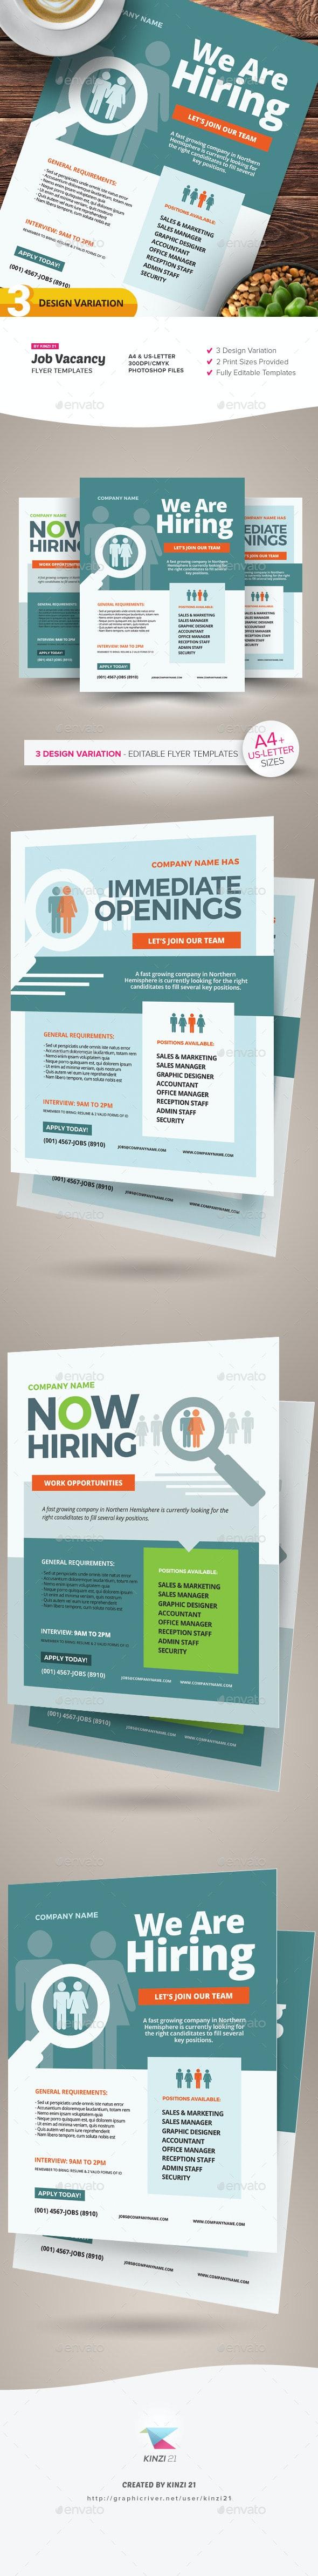 Job Vacancy Flyer Templates - Corporate Flyers